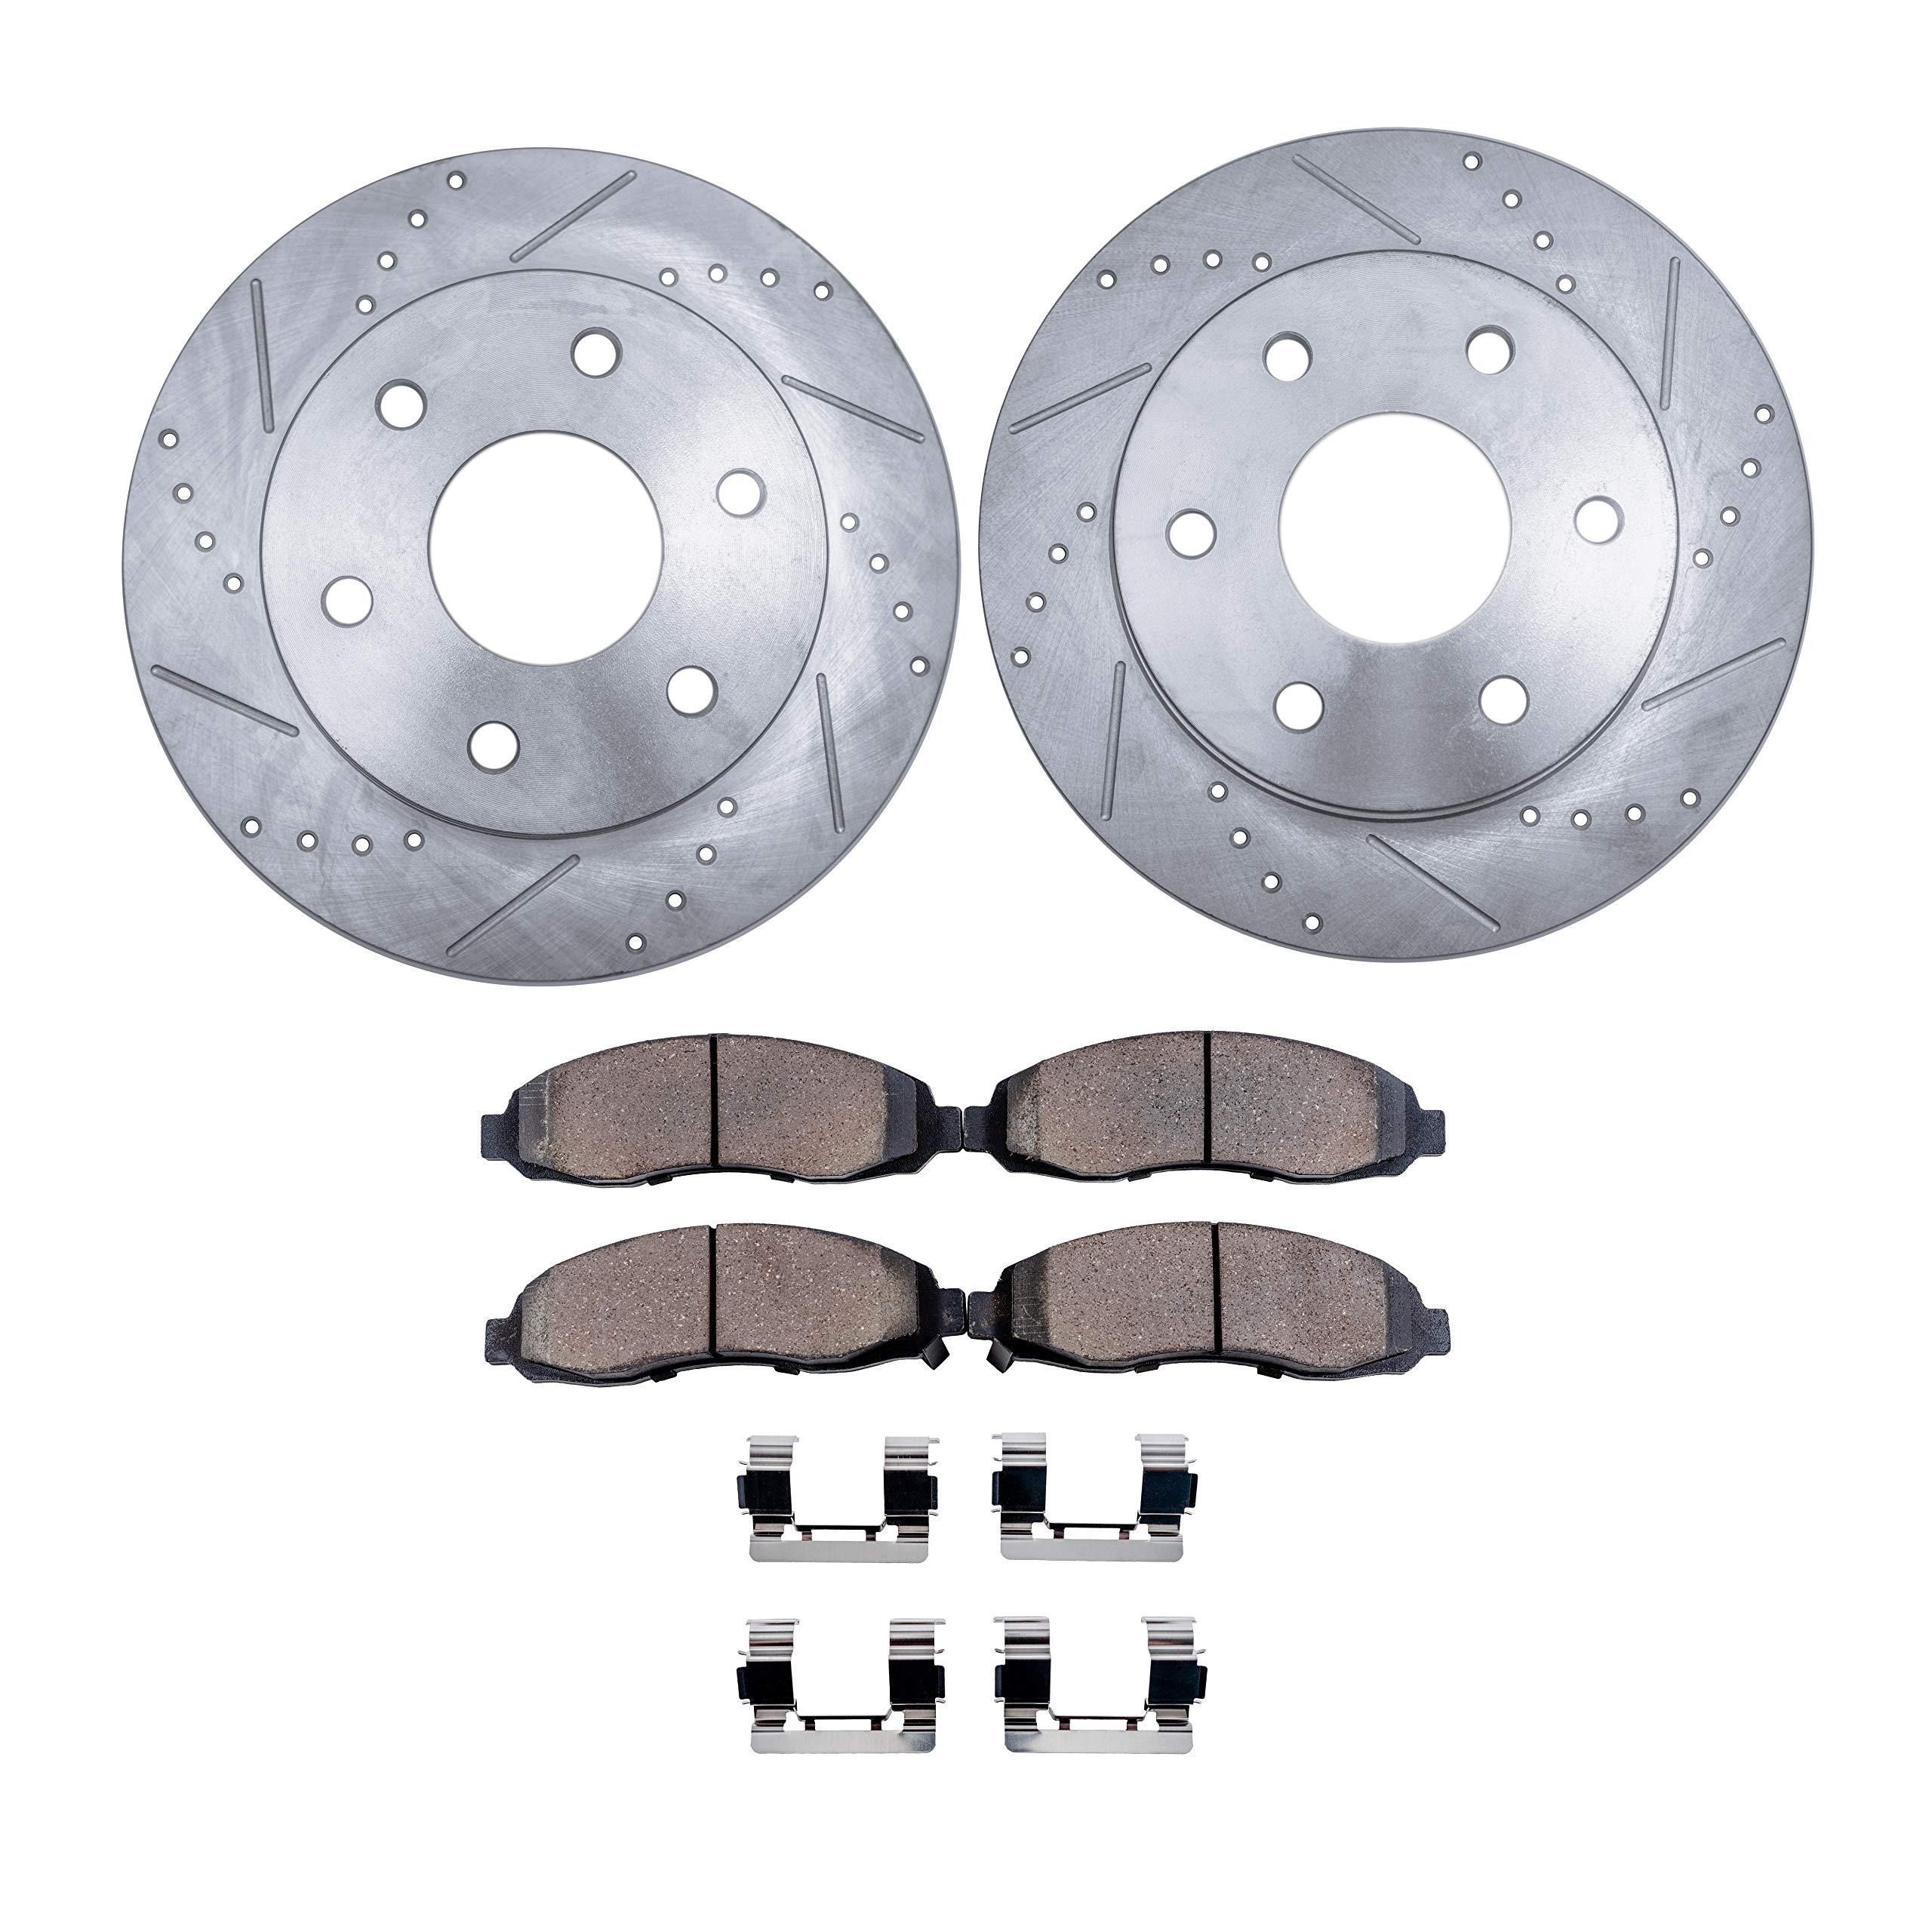 Detroit Axle - 11.65'' Drilled & Slotted FRONT Brake Rotors & Brake Pads w/Clips Hardware Kit for 05-17 Nissan Frontier - [05-12 Pathfinder V6] -05-15 Xterra - [09-12 Suzuki Equator 6 Cylidner]